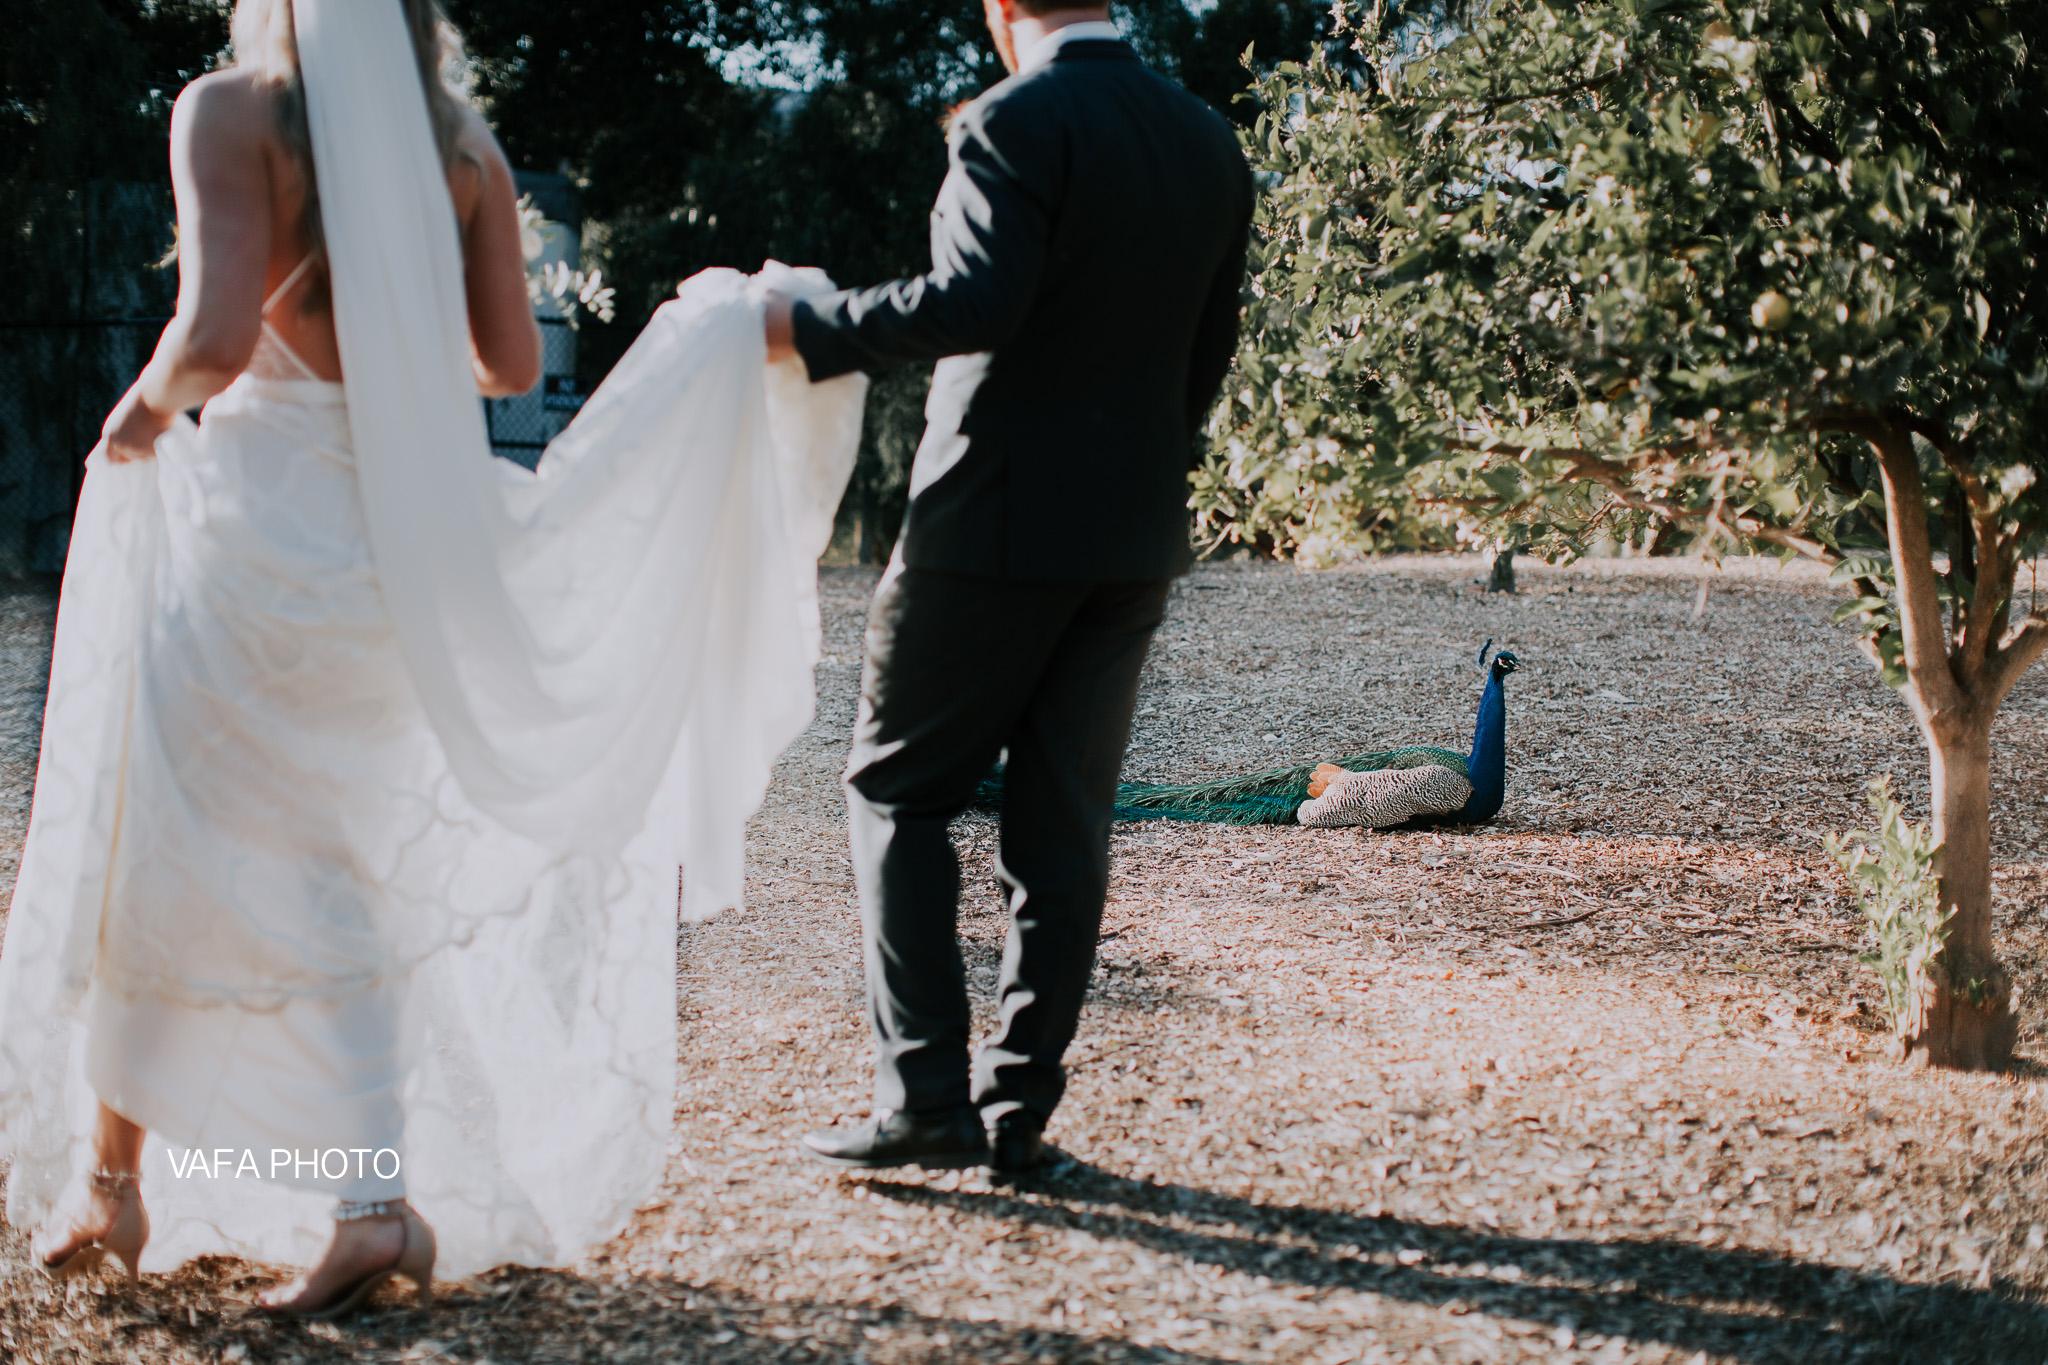 Leo-Carrillo-Ranch-Wedding-Lauren-Mike-Vafa-Photo-705.jpg